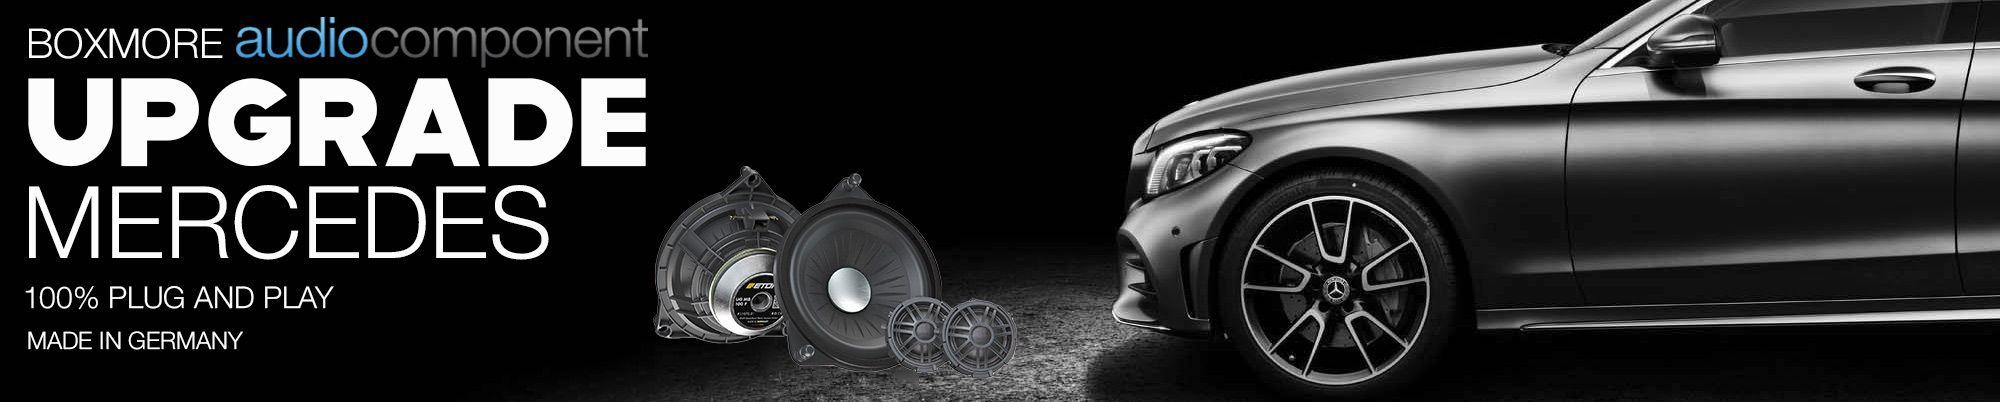 Sistemas de alta fidelidad Car Audio HIFI para Mercedes Benz